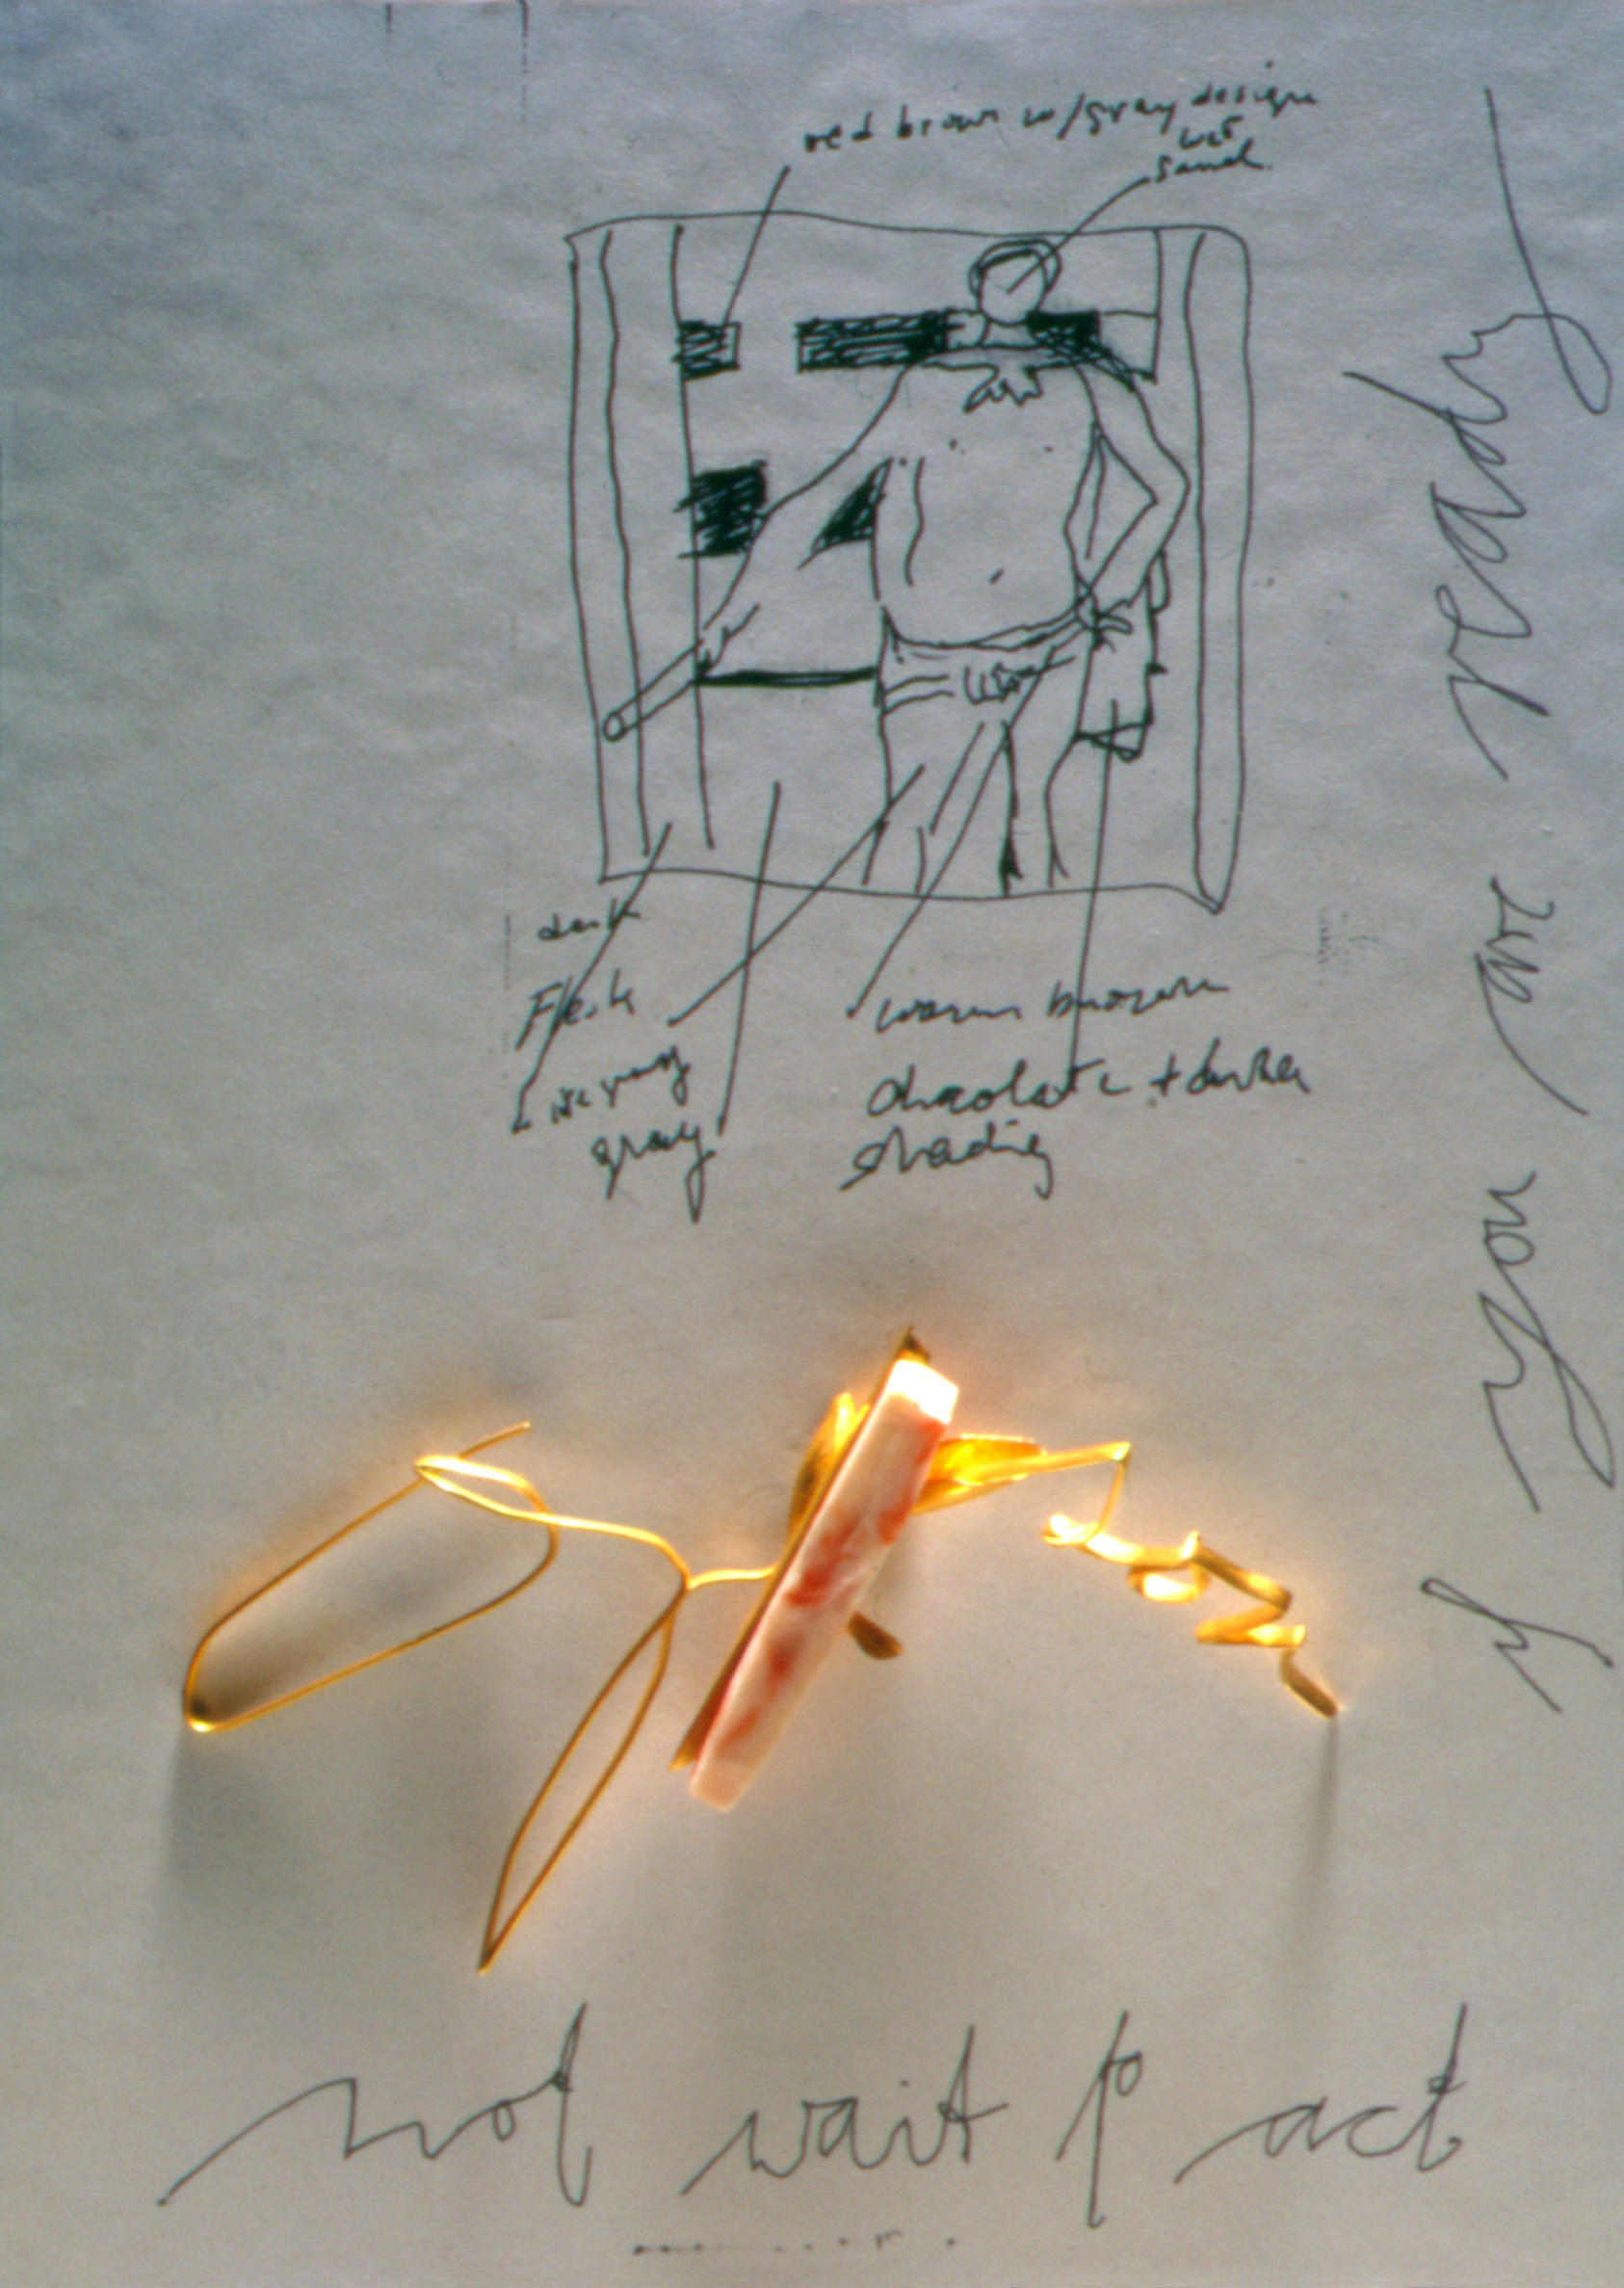 Manfred Bischoff, Or-Son, 2002 Brooch, fine gold and coral, 3 ¼ x 4 x 1 in., displayed on a painting on paper created by Bischoff for his Gardner exhibition. © Manfred Bischoff, Aurelio Amendola, Isabella Stewart Gardner Museum